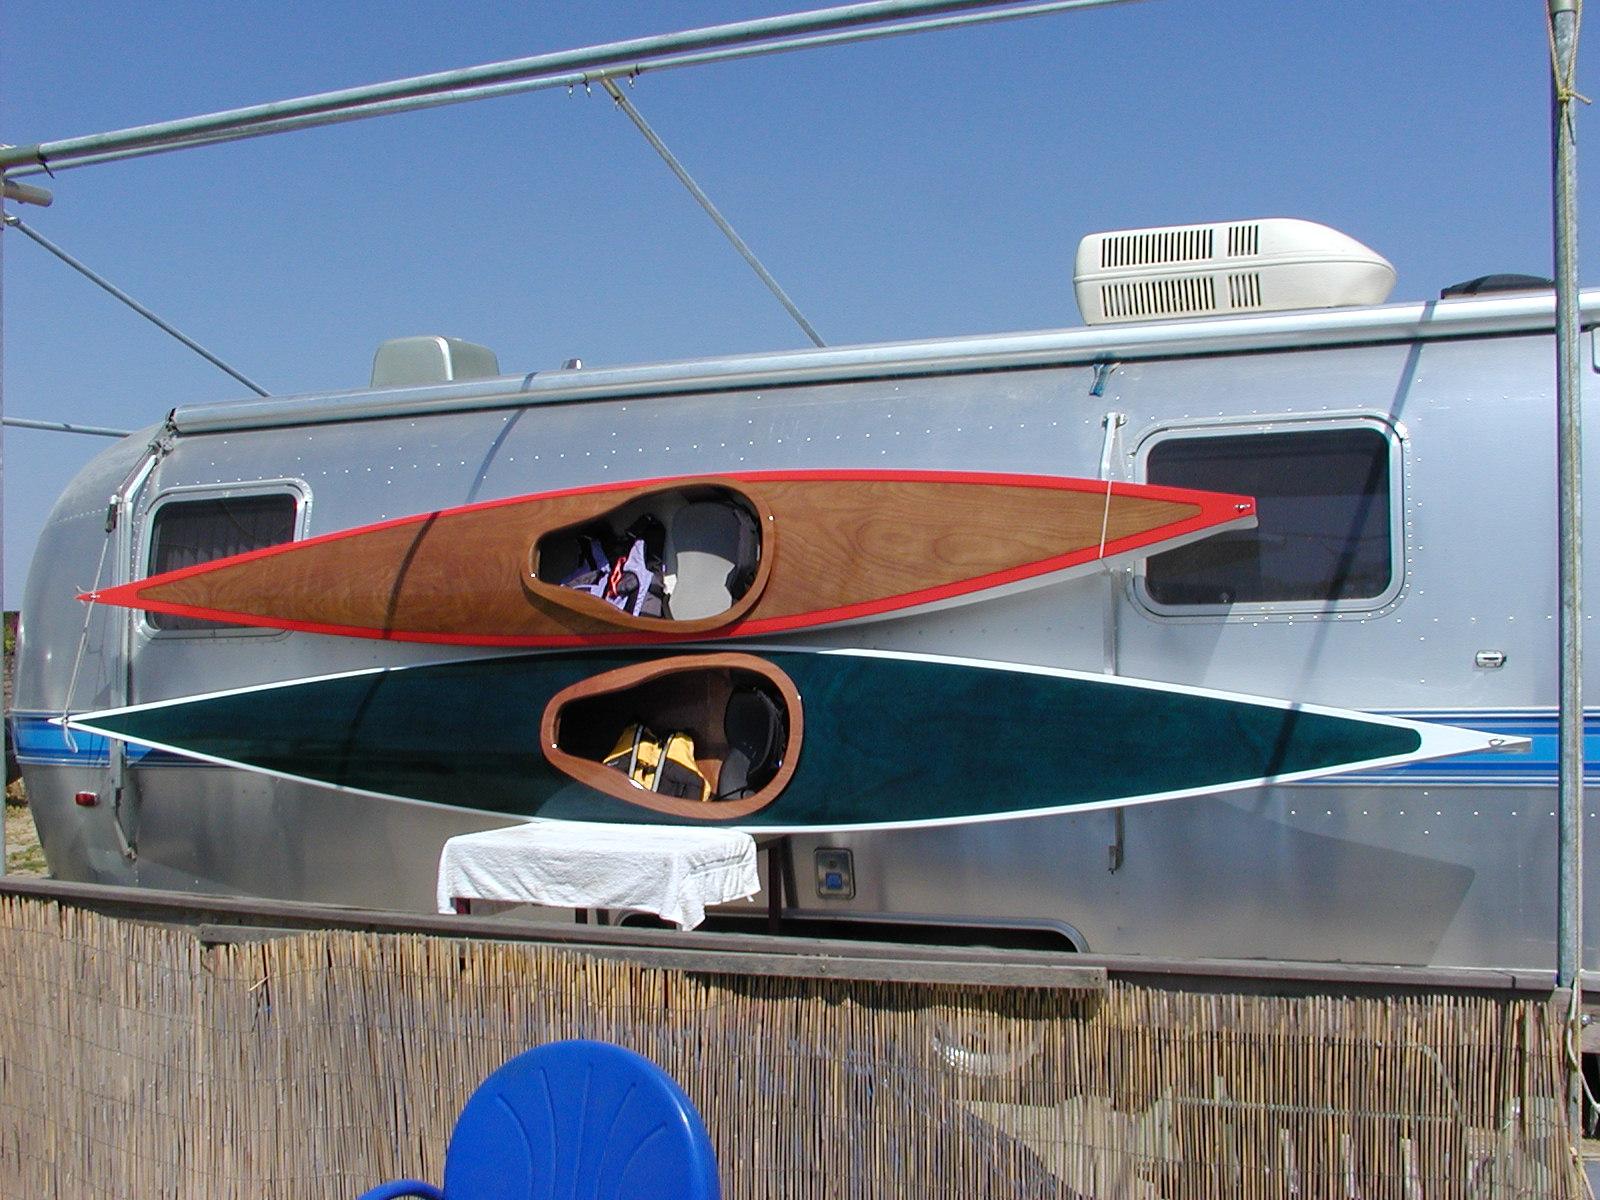 Click image for larger version  Name:Kayak 143.jpg Views:677 Size:416.2 KB ID:58761